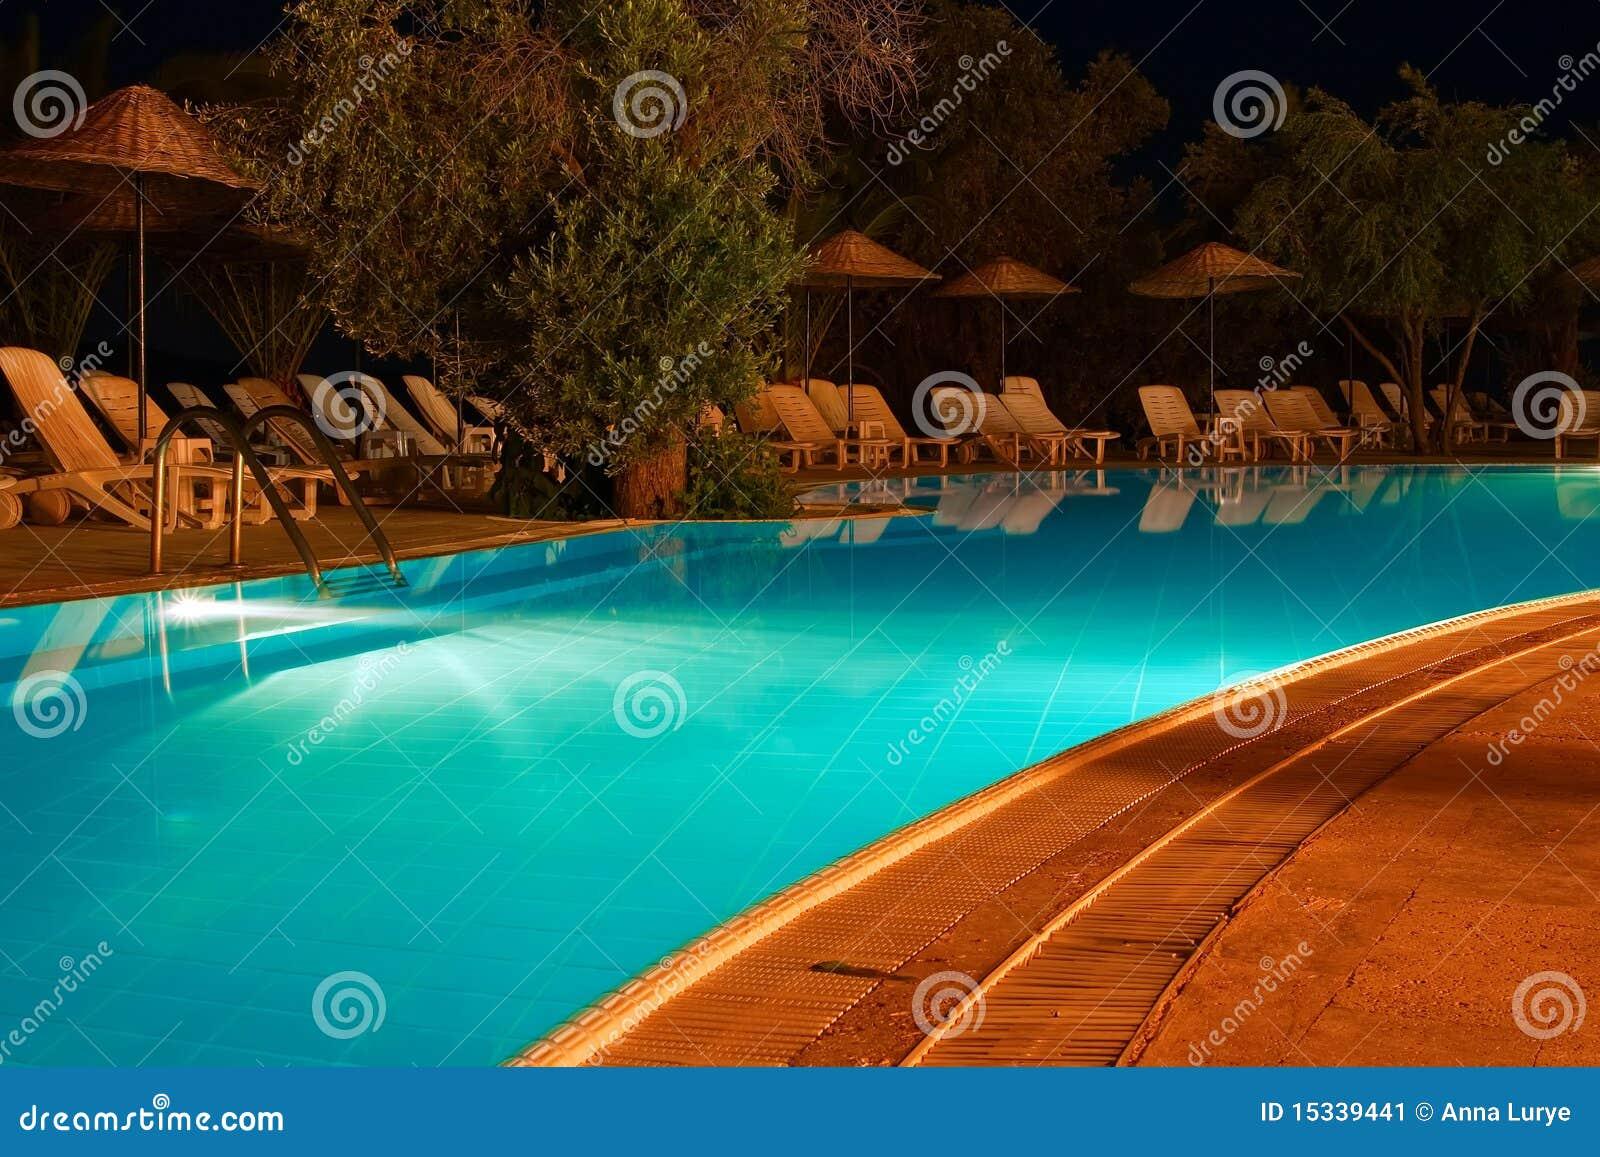 Swimming Pool At Night Stock Image Image 15339441